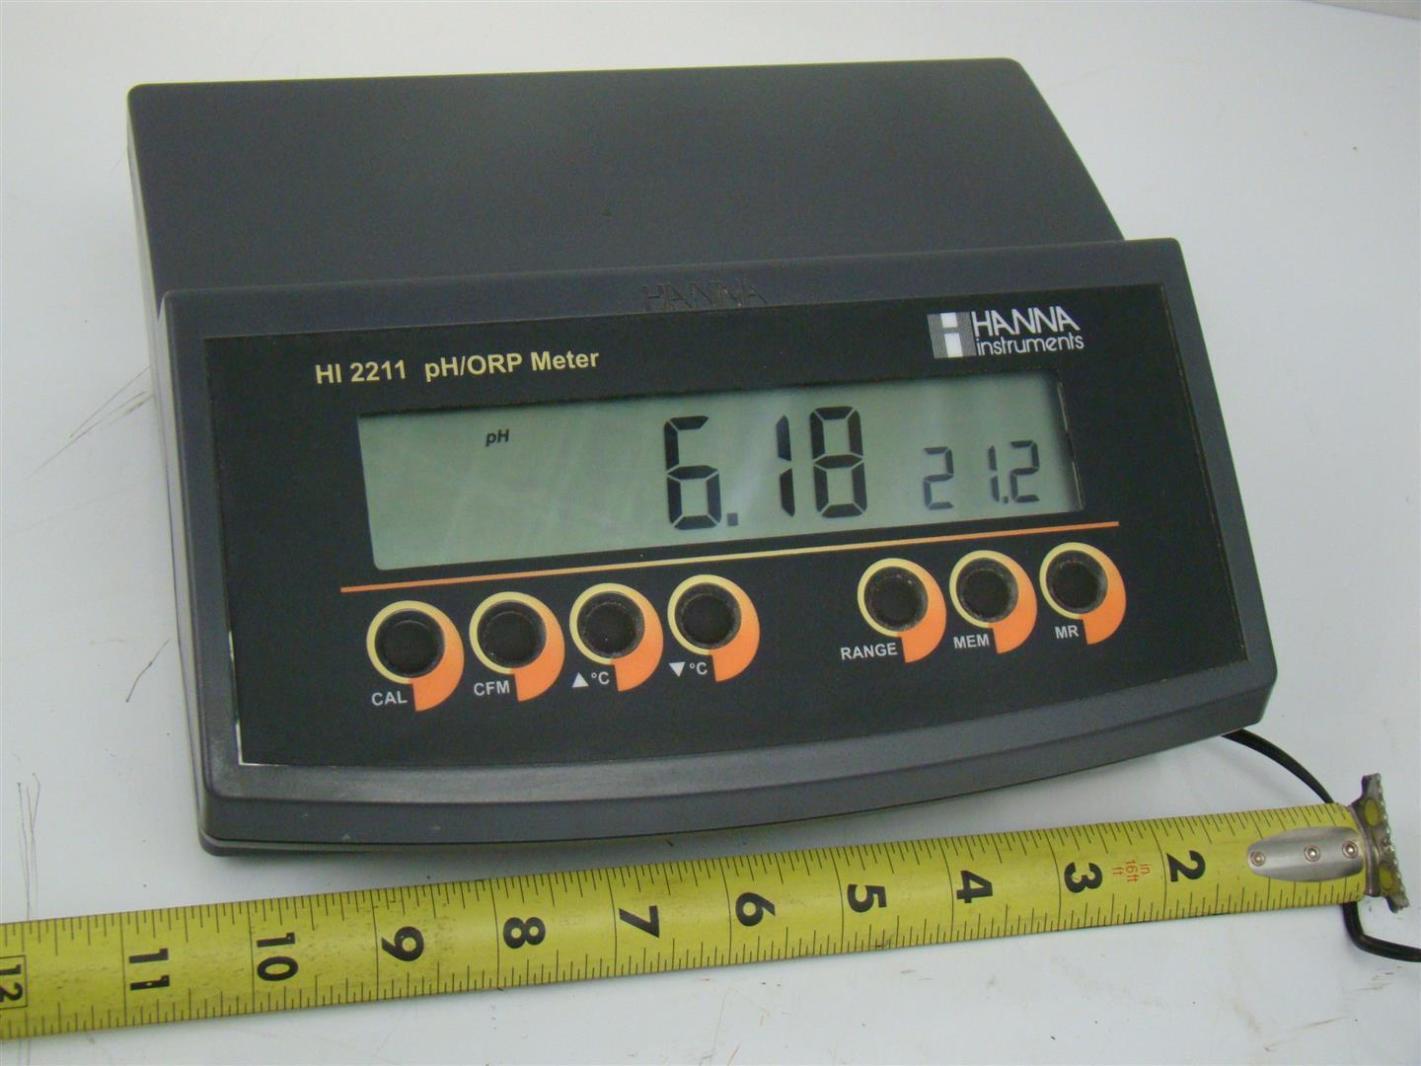 Hanna Ph Meter : Hanna temperature ph orp benchtop meter hi